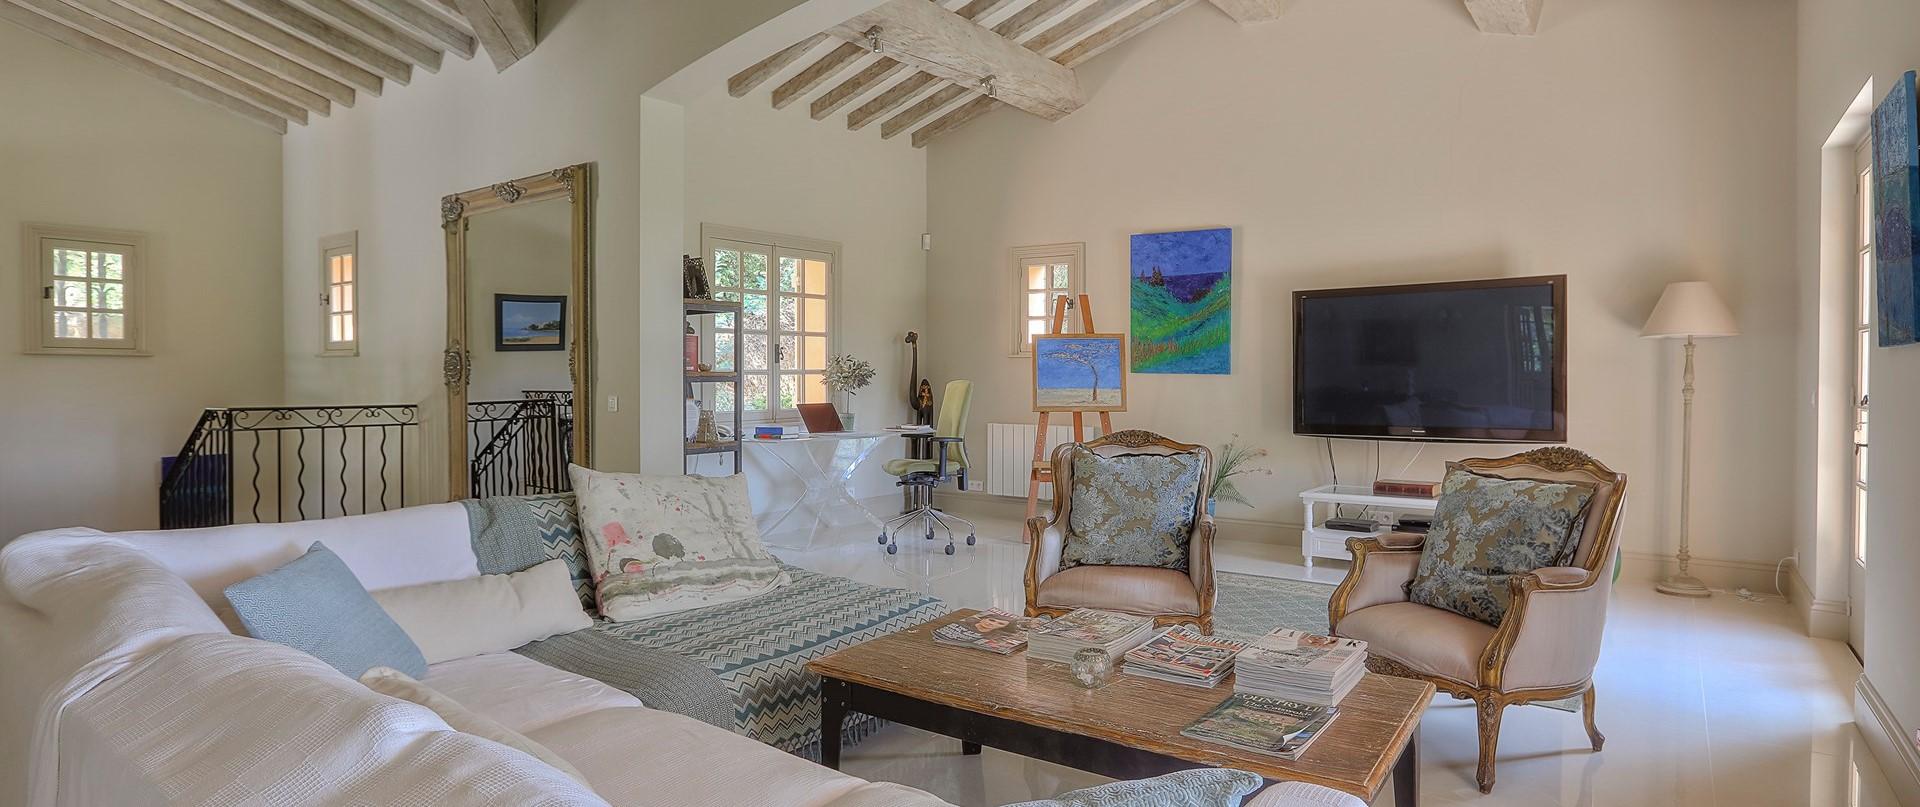 villa-gigaro-3-bedroom-living-space